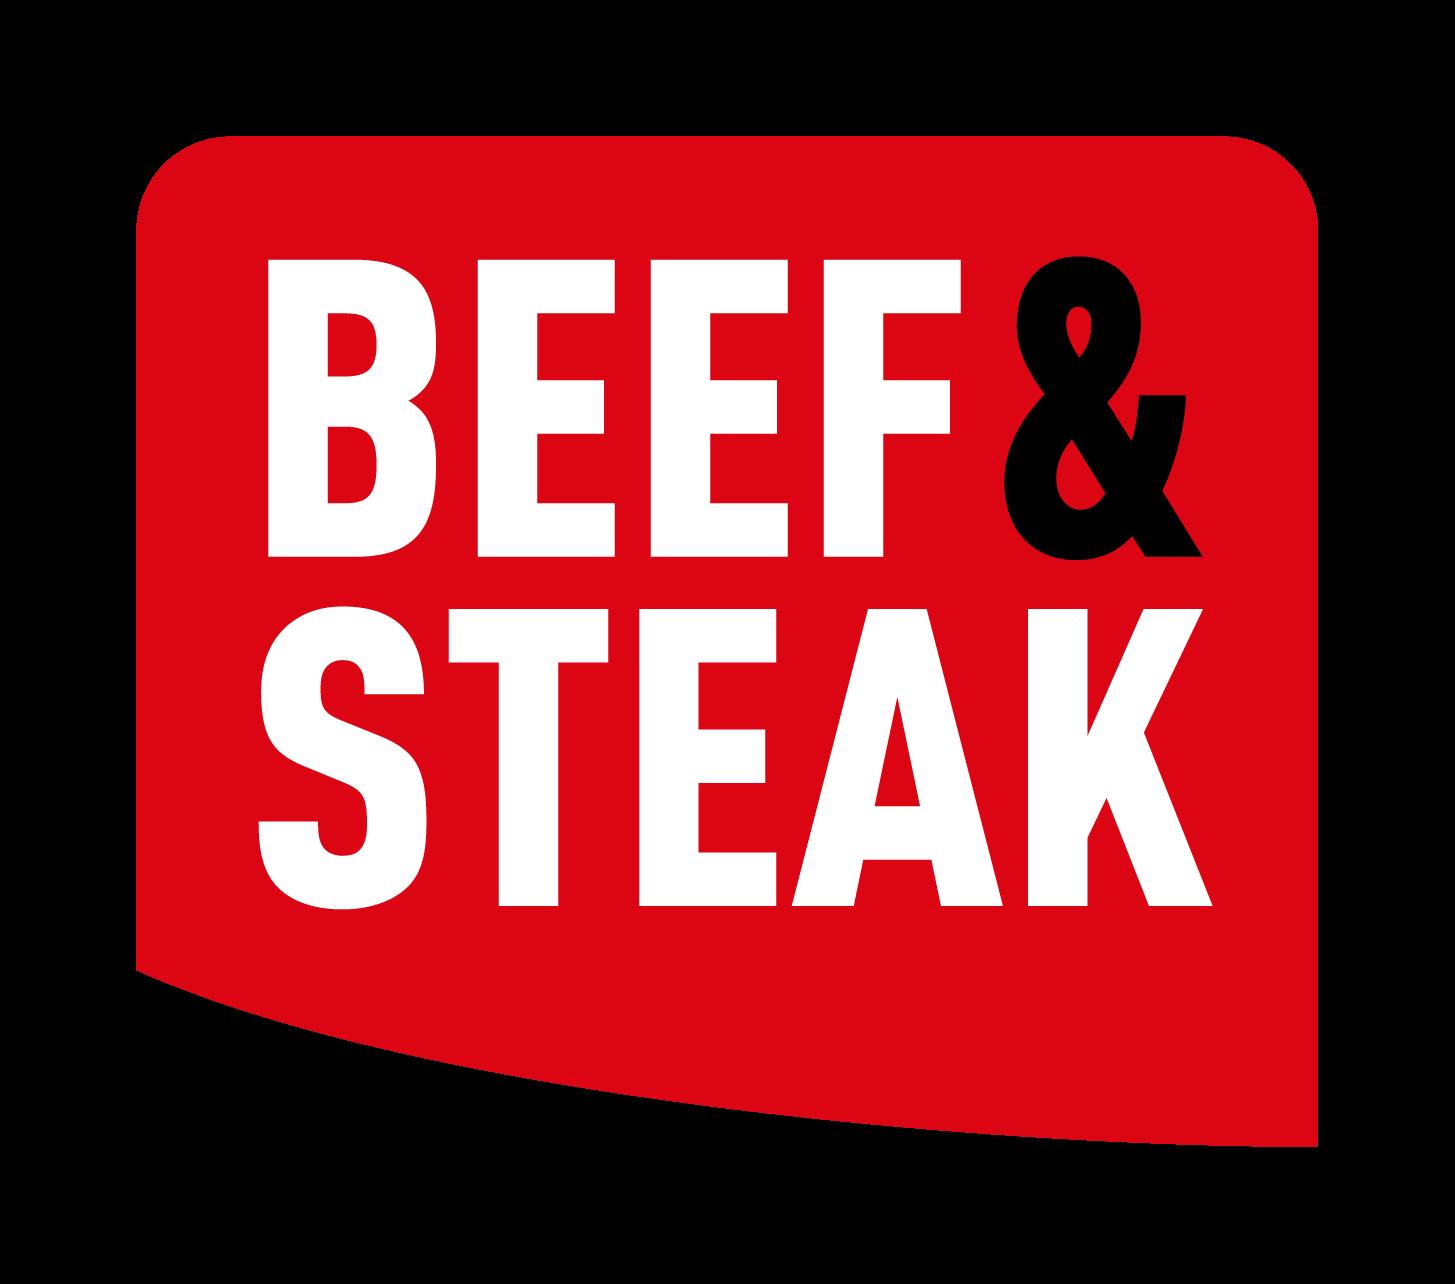 usa-st-louis-style-ribs-vleeskant